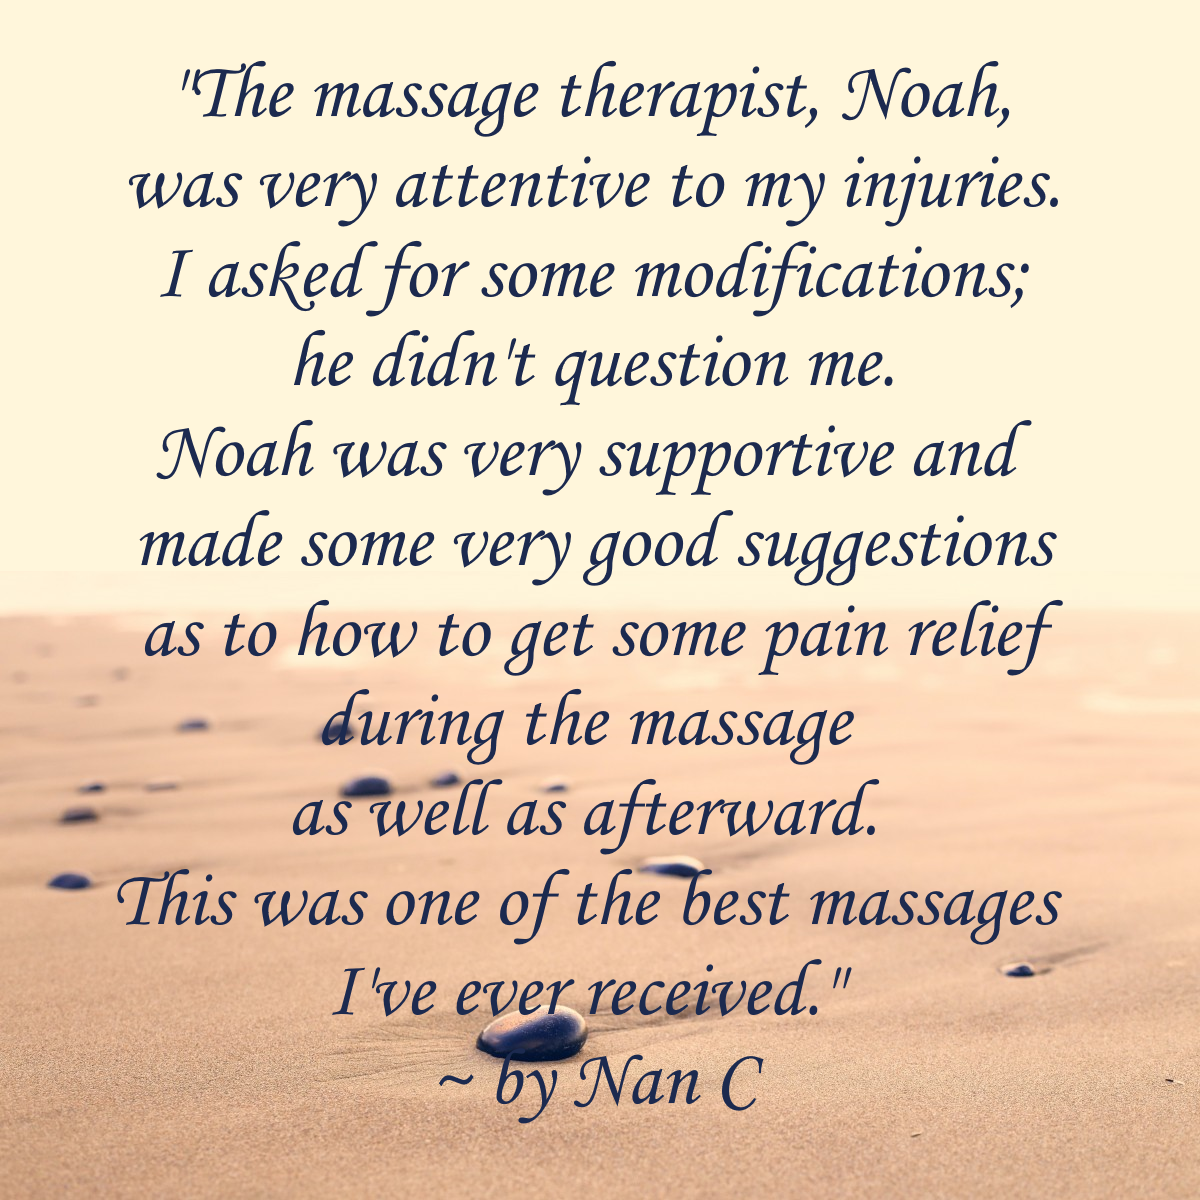 Testimonial for Noah